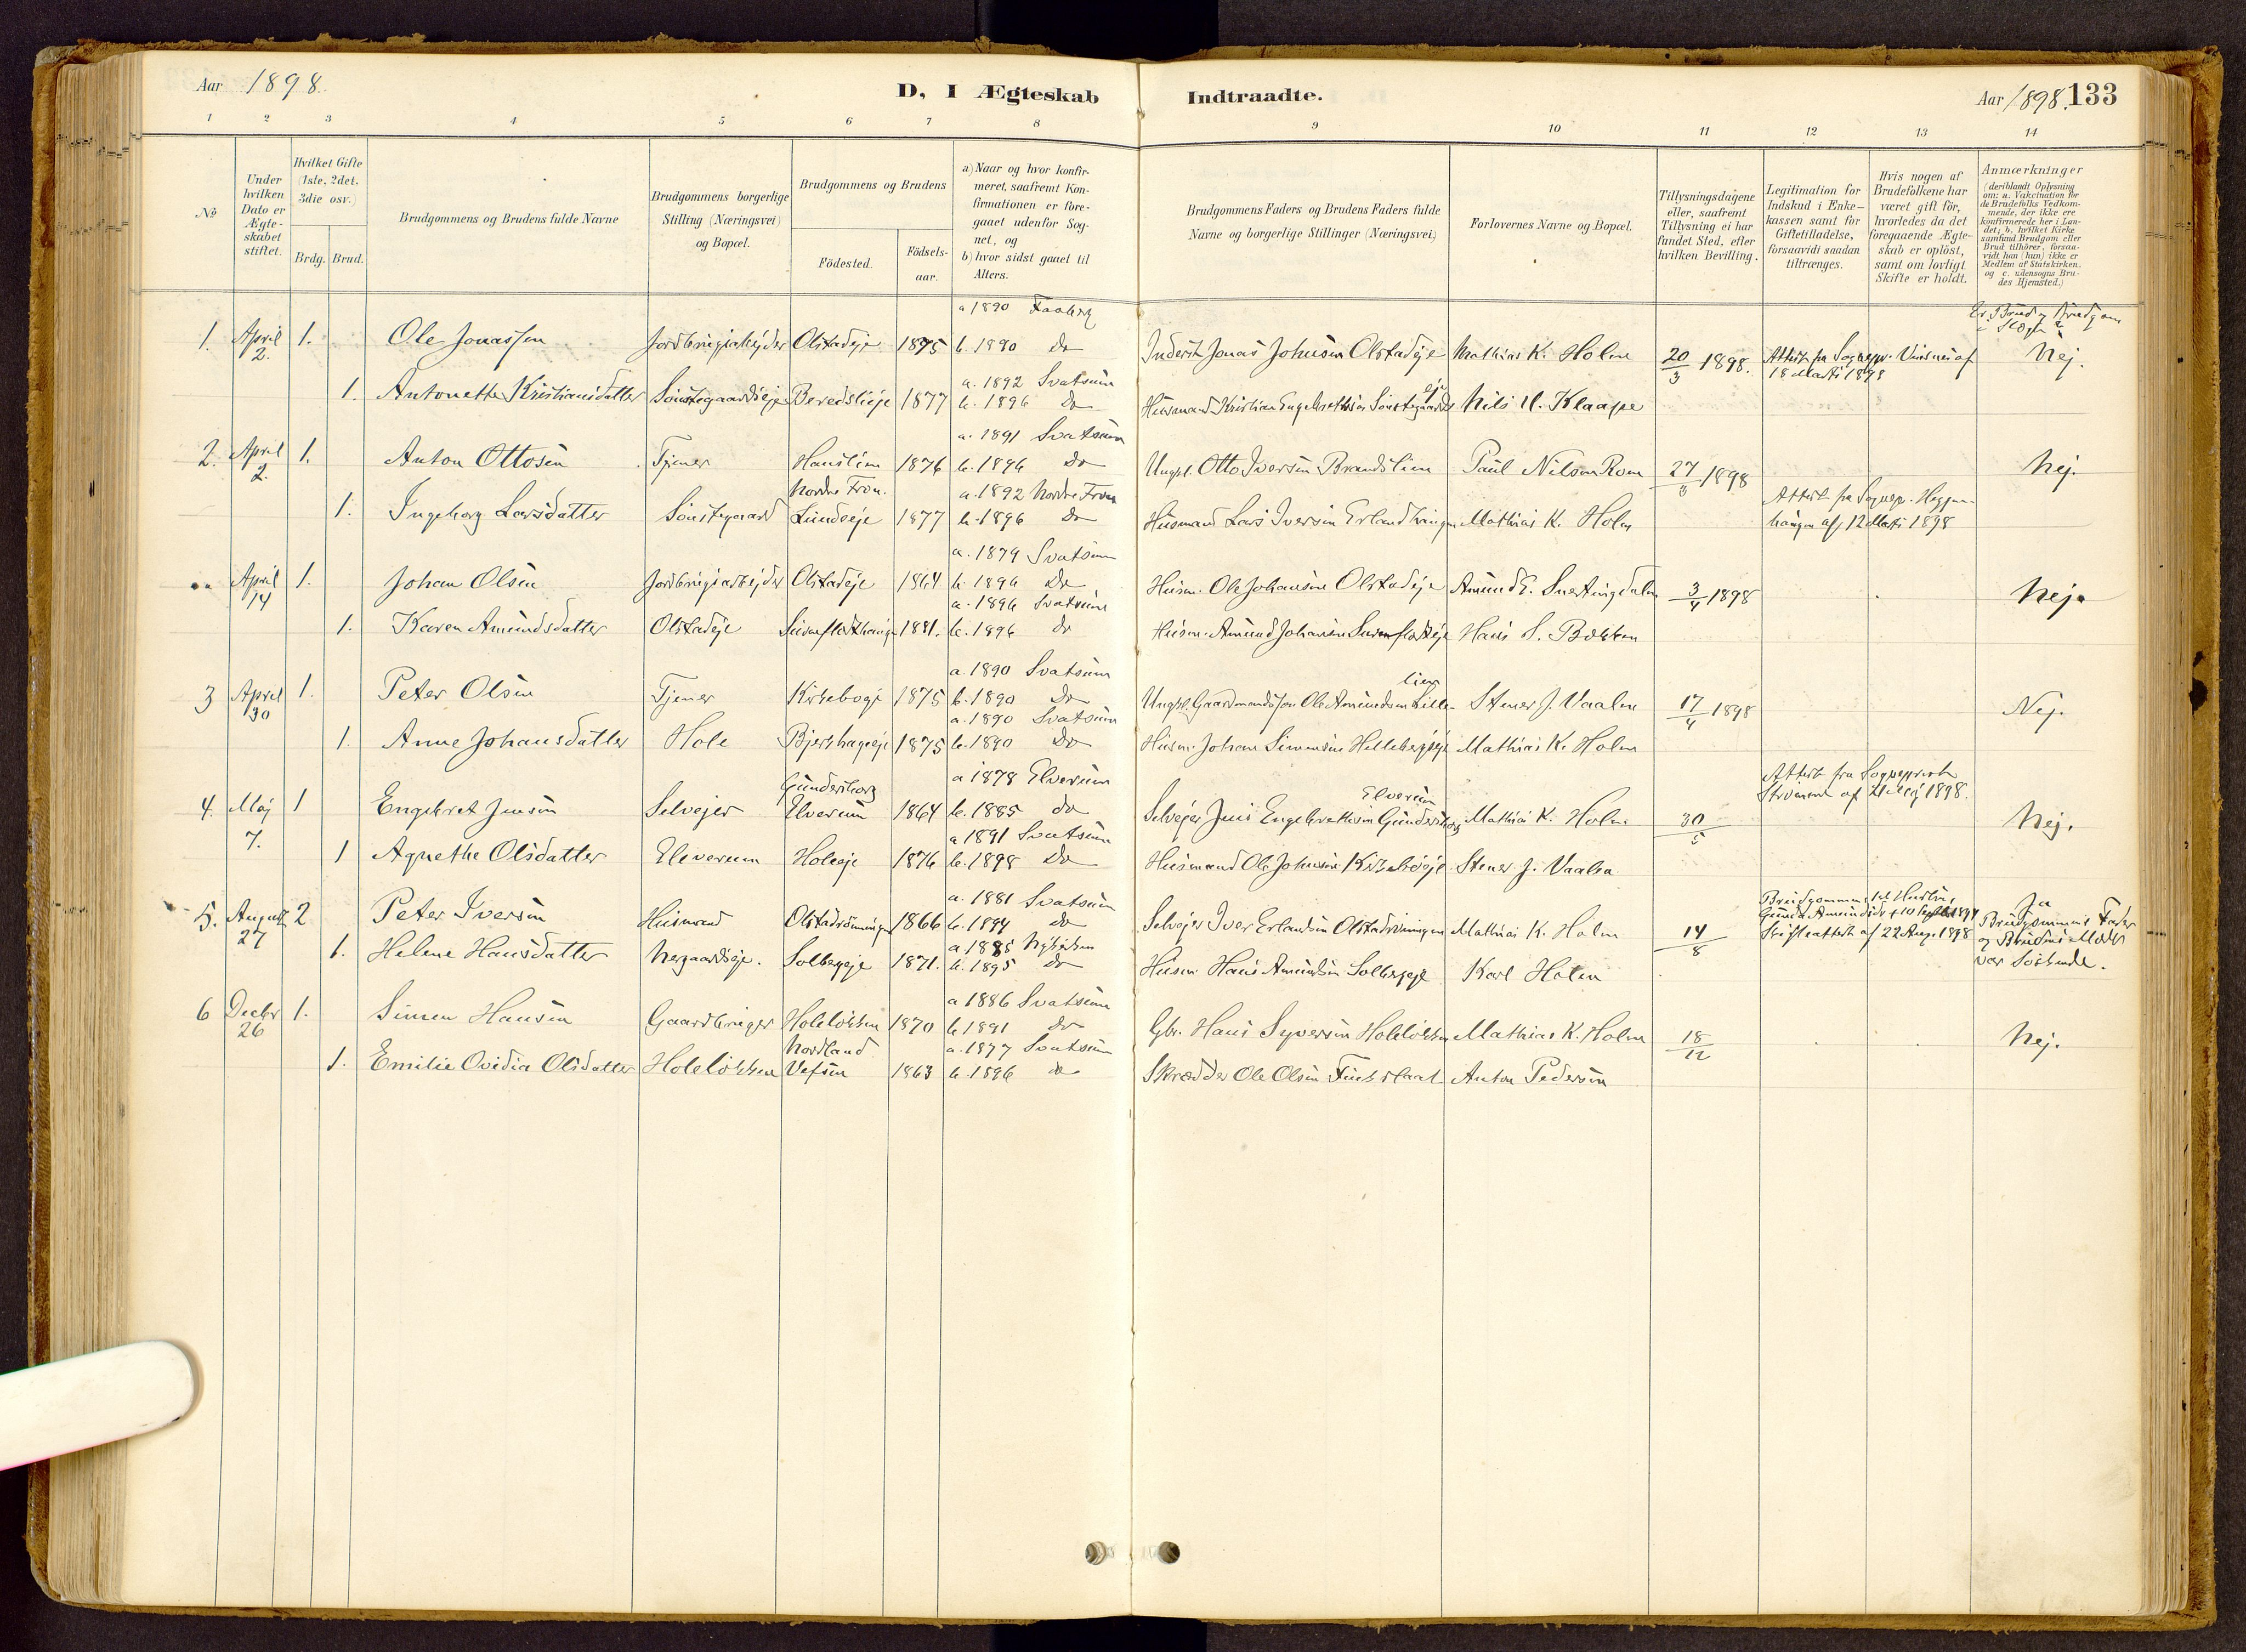 SAH, Vestre Gausdal prestekontor, Ministerialbok nr. 2, 1887-1918, s. 133